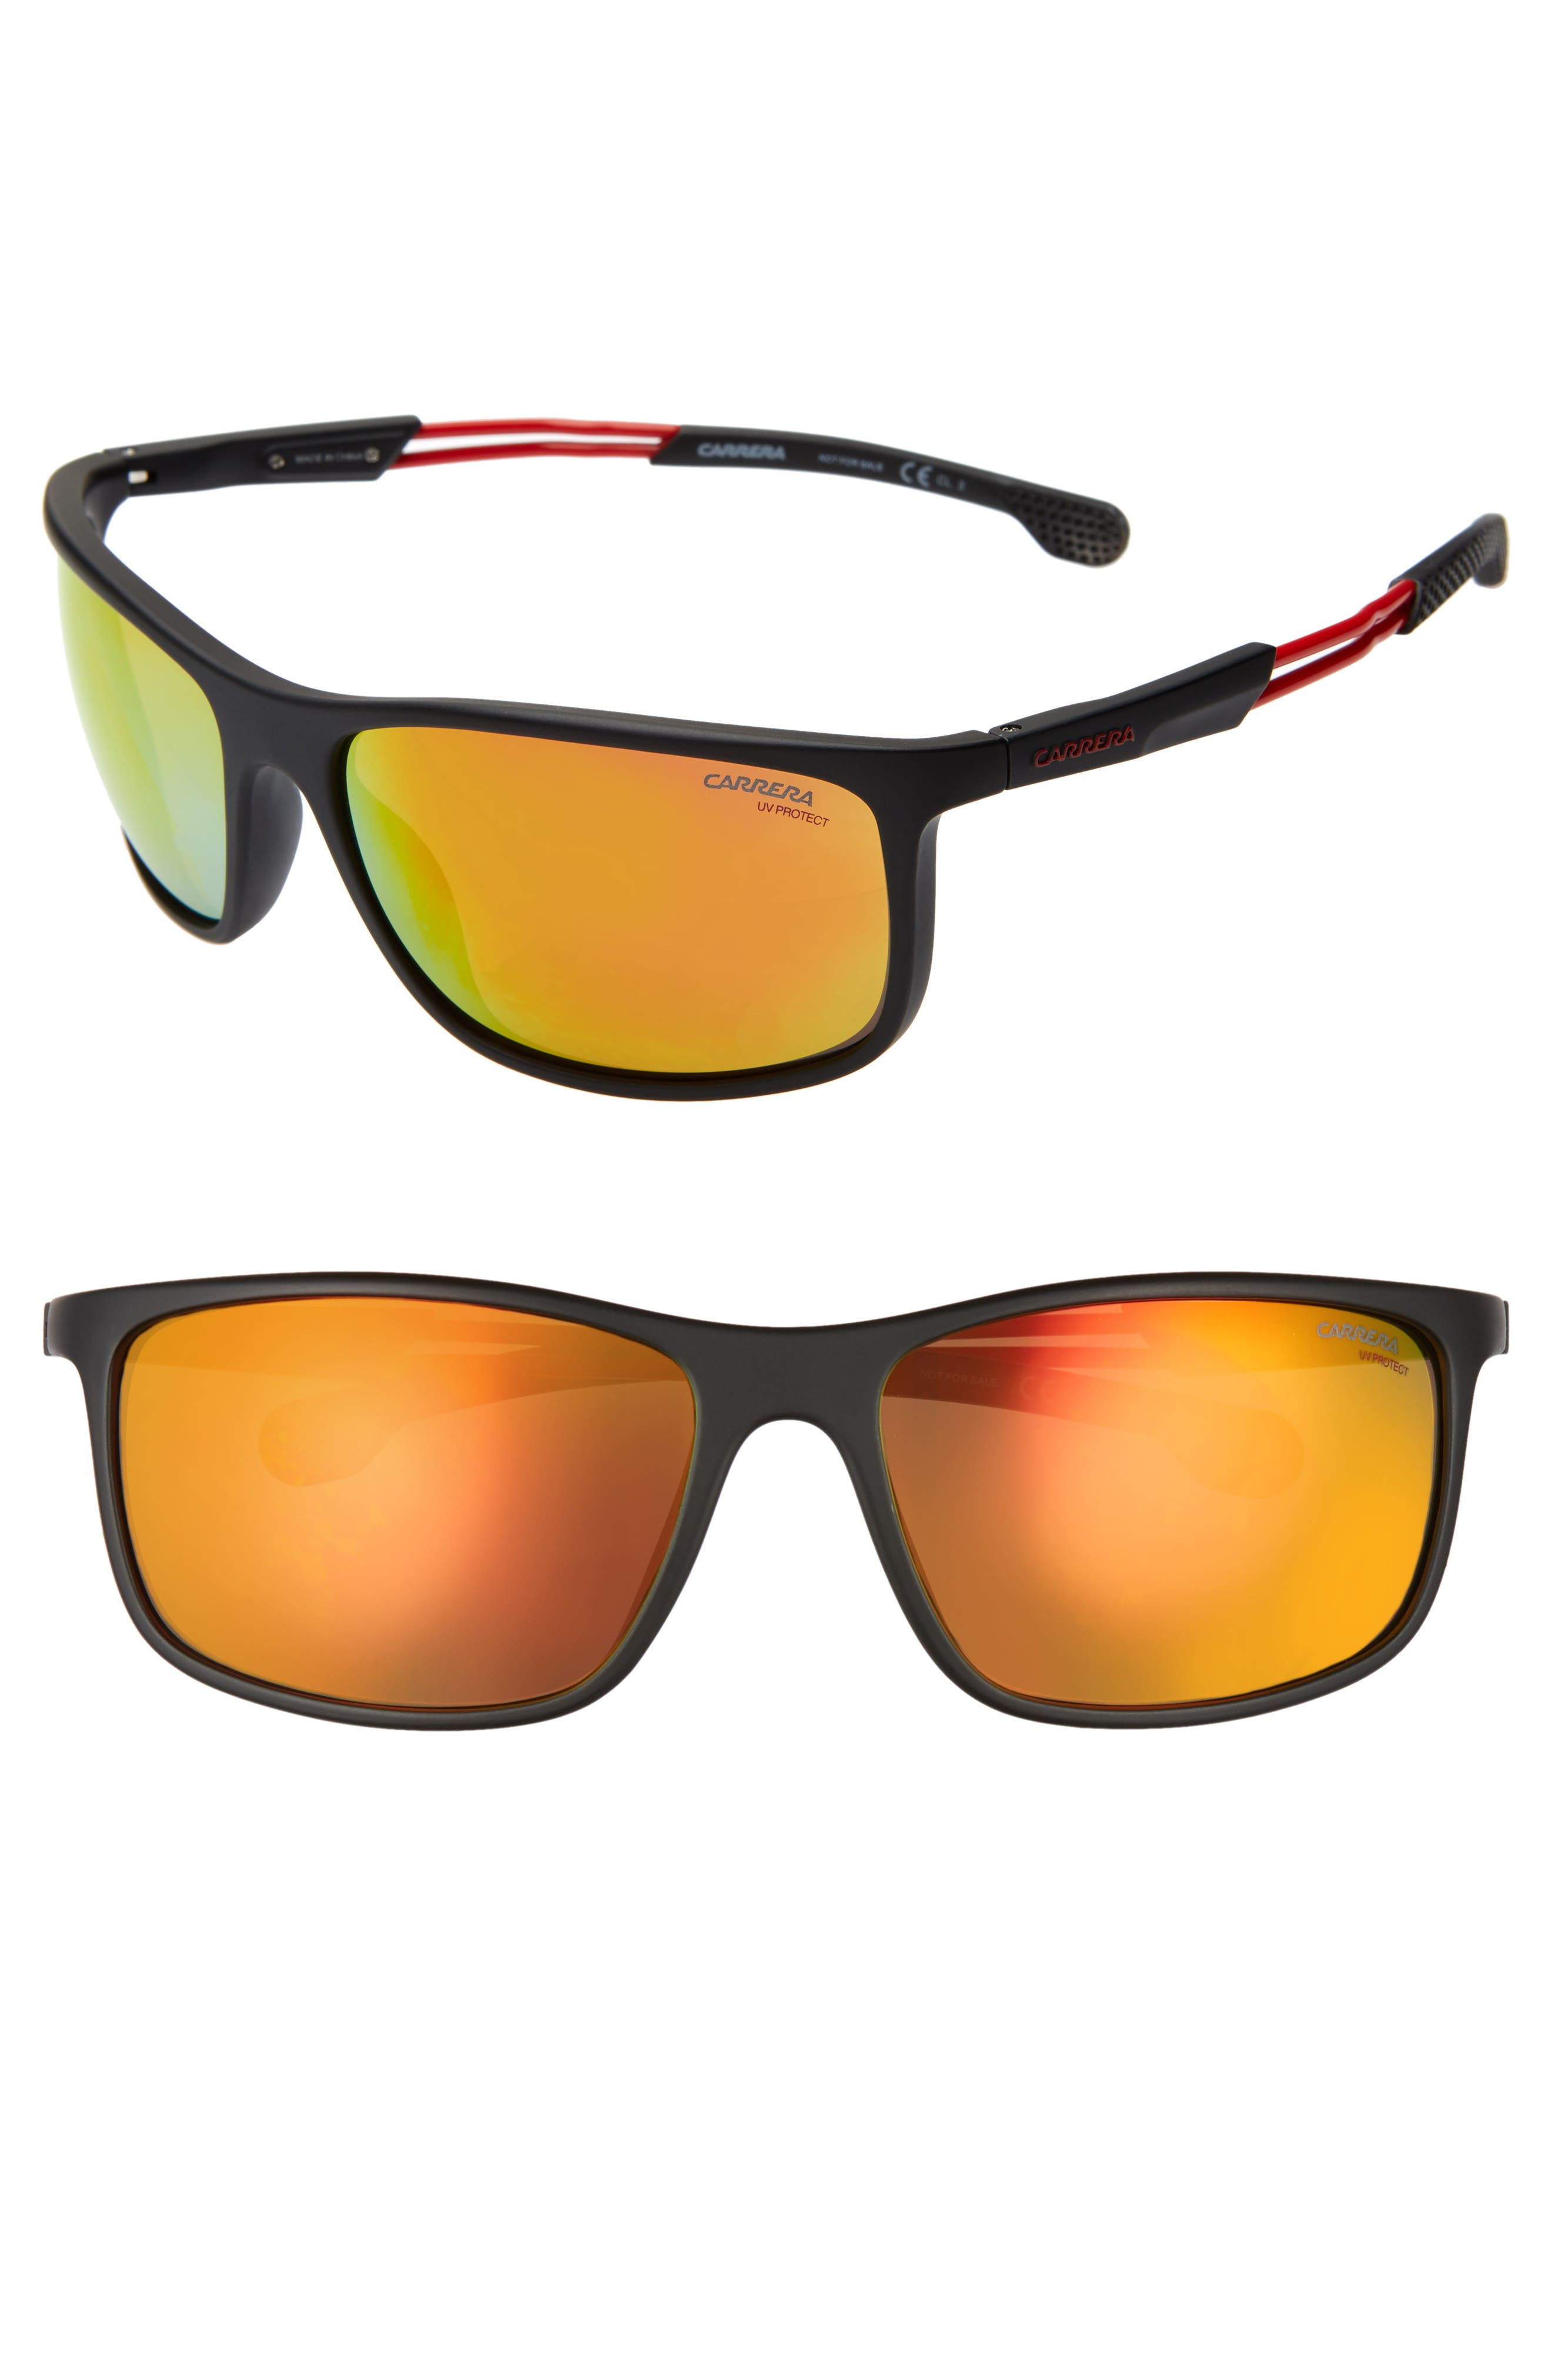 Carrera Eyewear 62Mm Wrap Sunglasses - Black/ Red Mirror